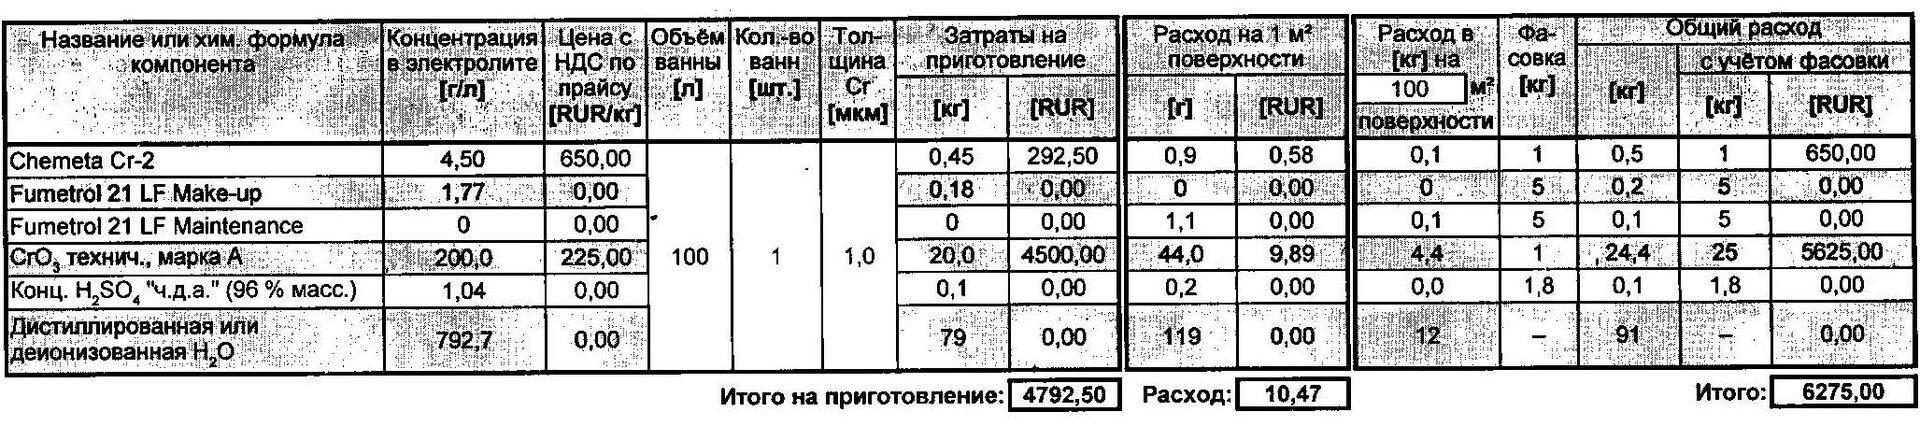 Расчет-Chemeta-Cr-2.